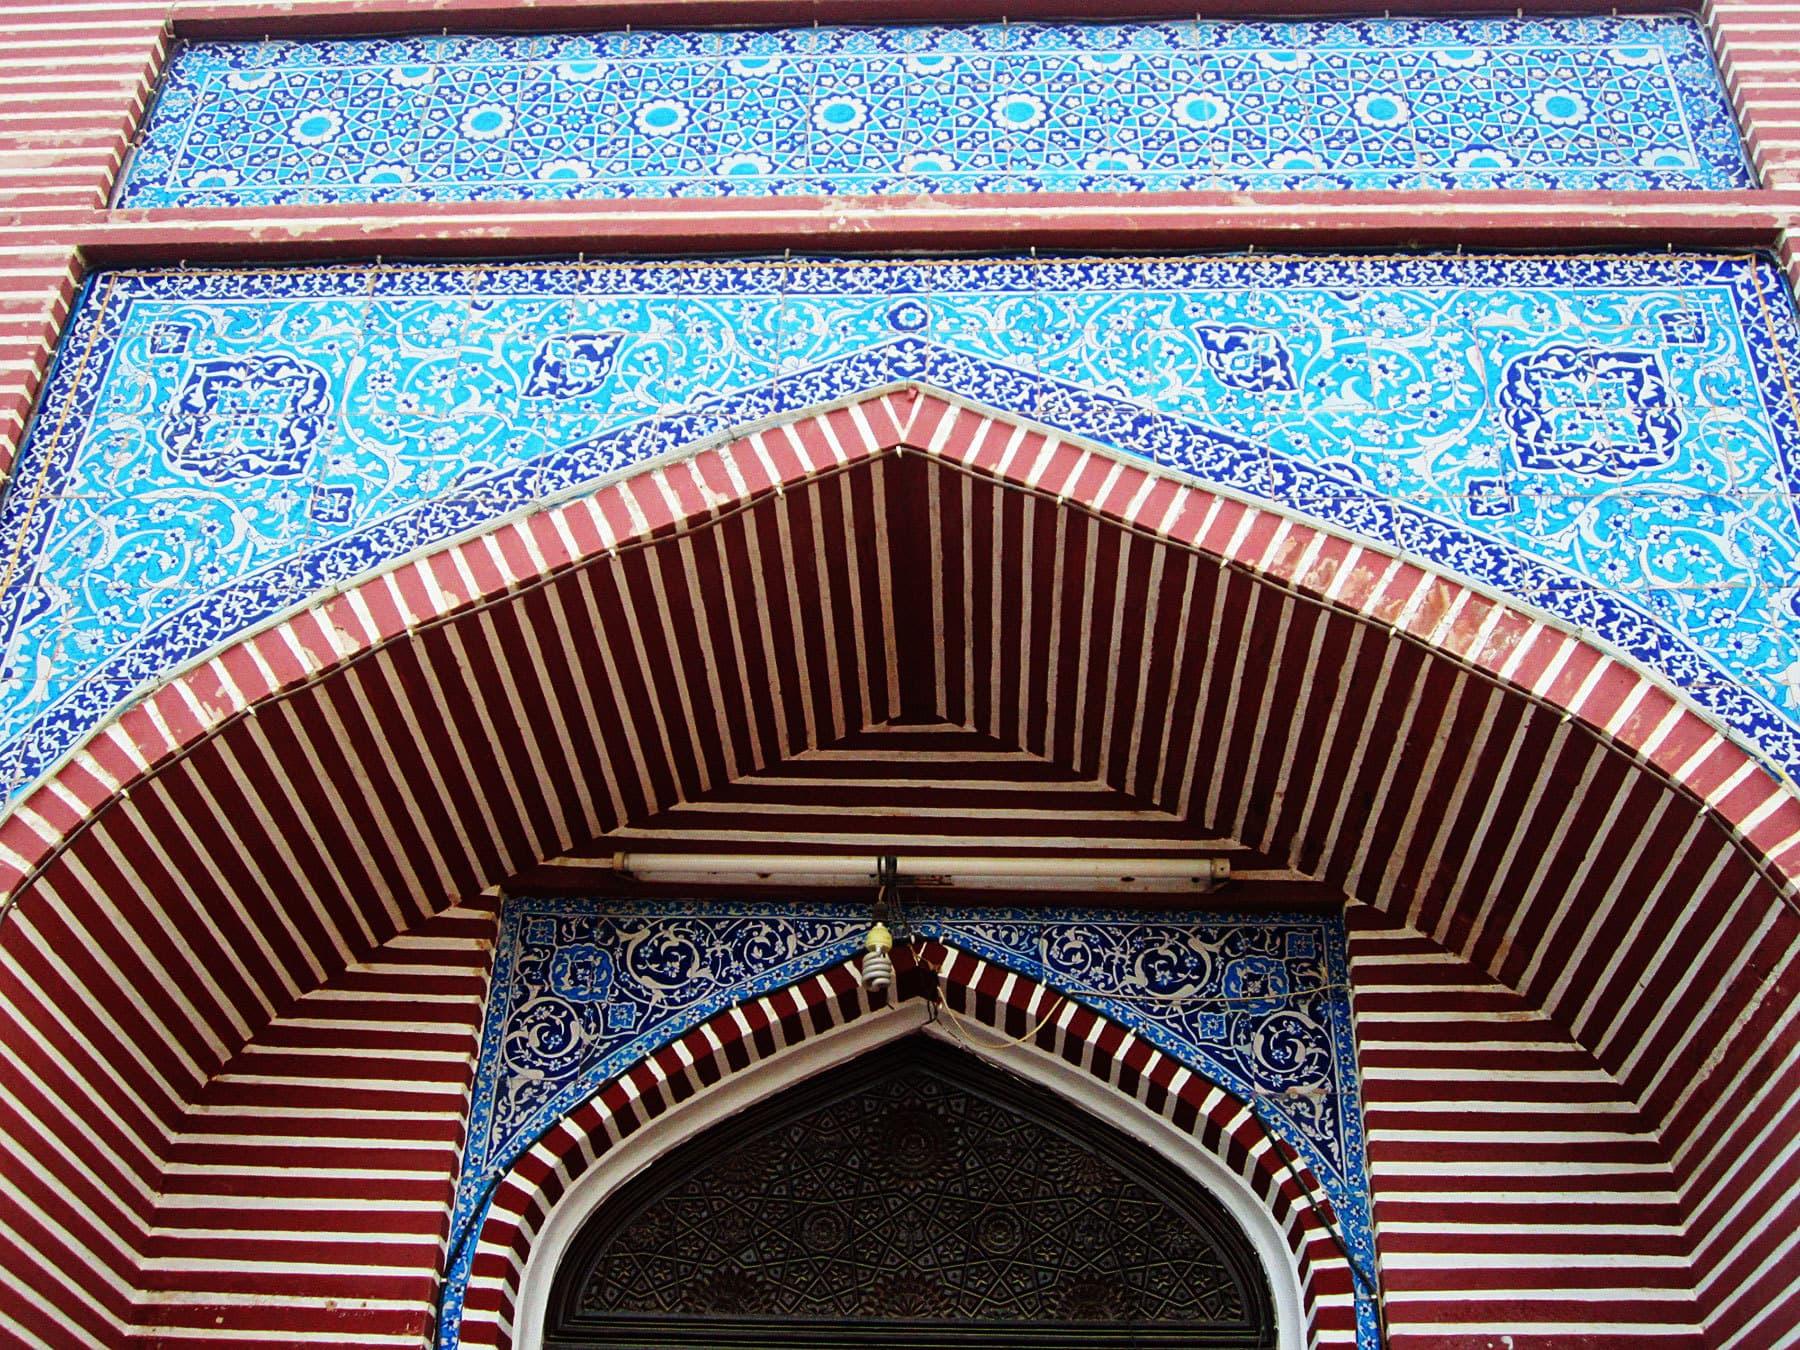 Artwork on the mehraabs.